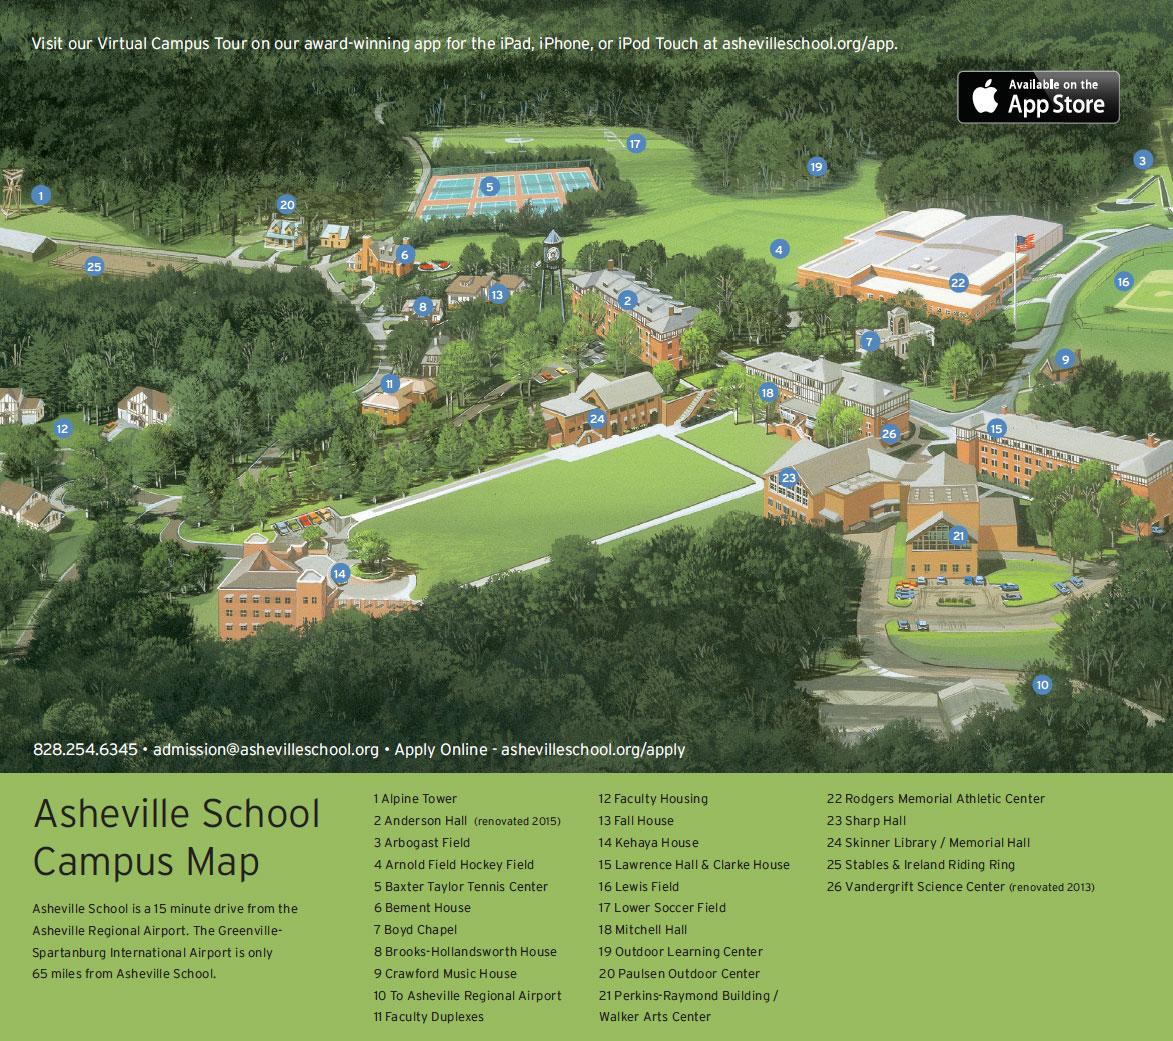 Asheville School   Campus Map